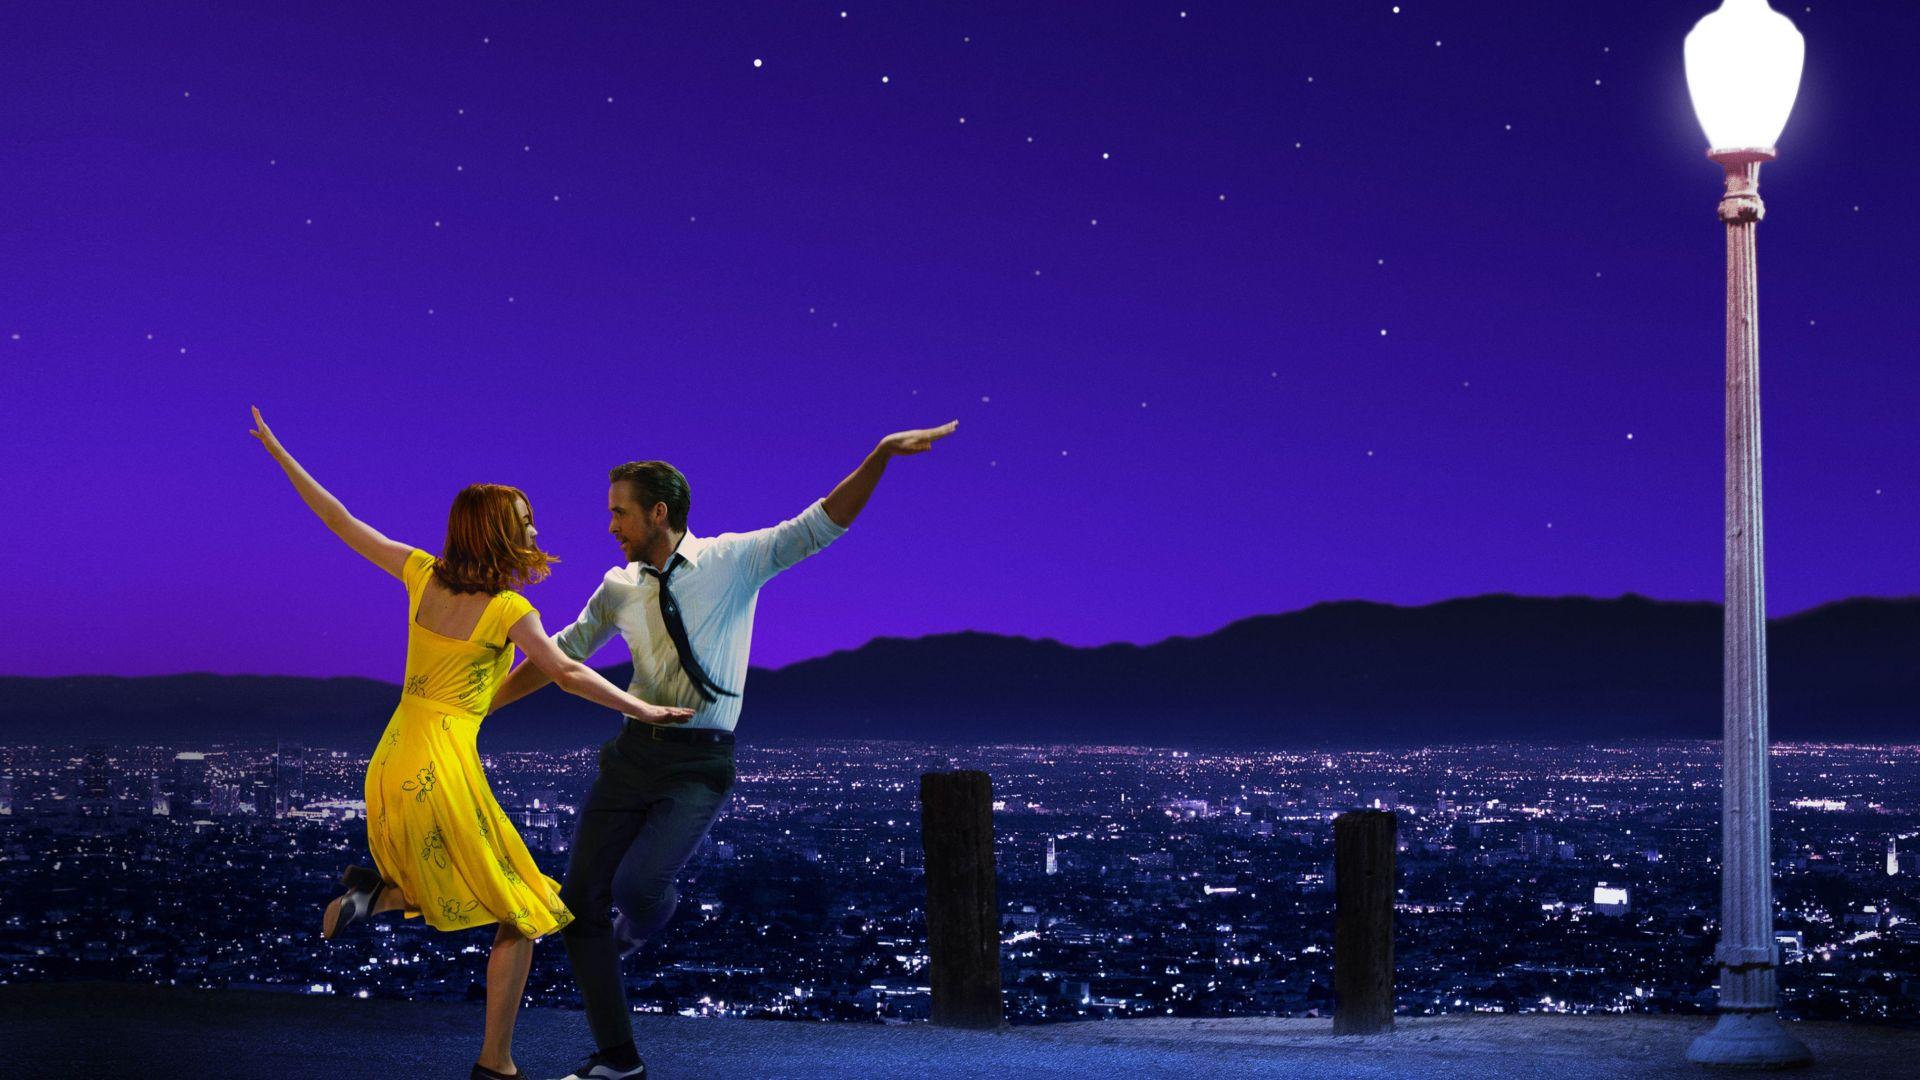 Wallpaper La La Land Ryan Gosling Emma Stone Movies 12467